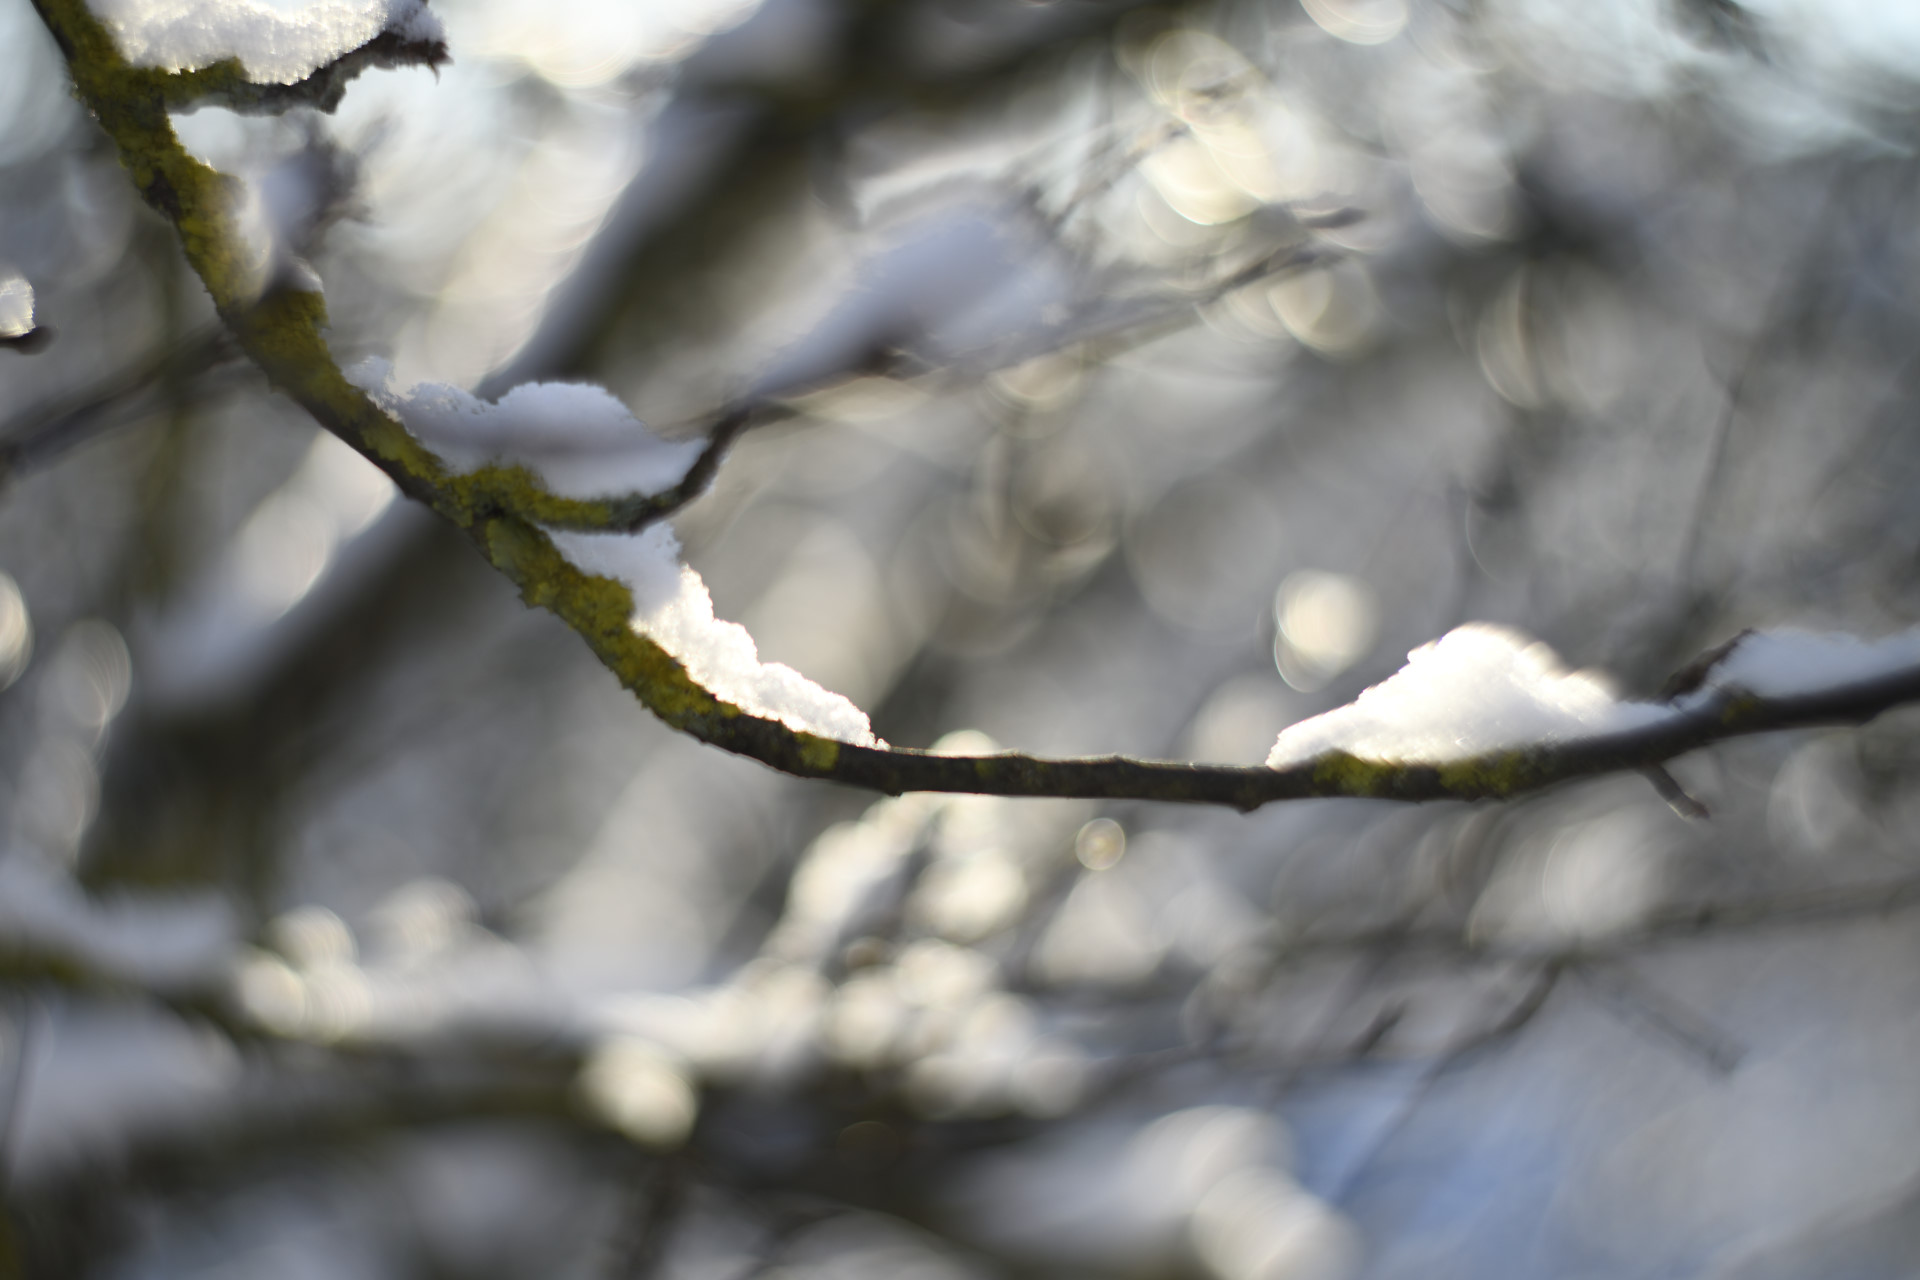 Petzval 85mm/2.8 foto Magnus Norden